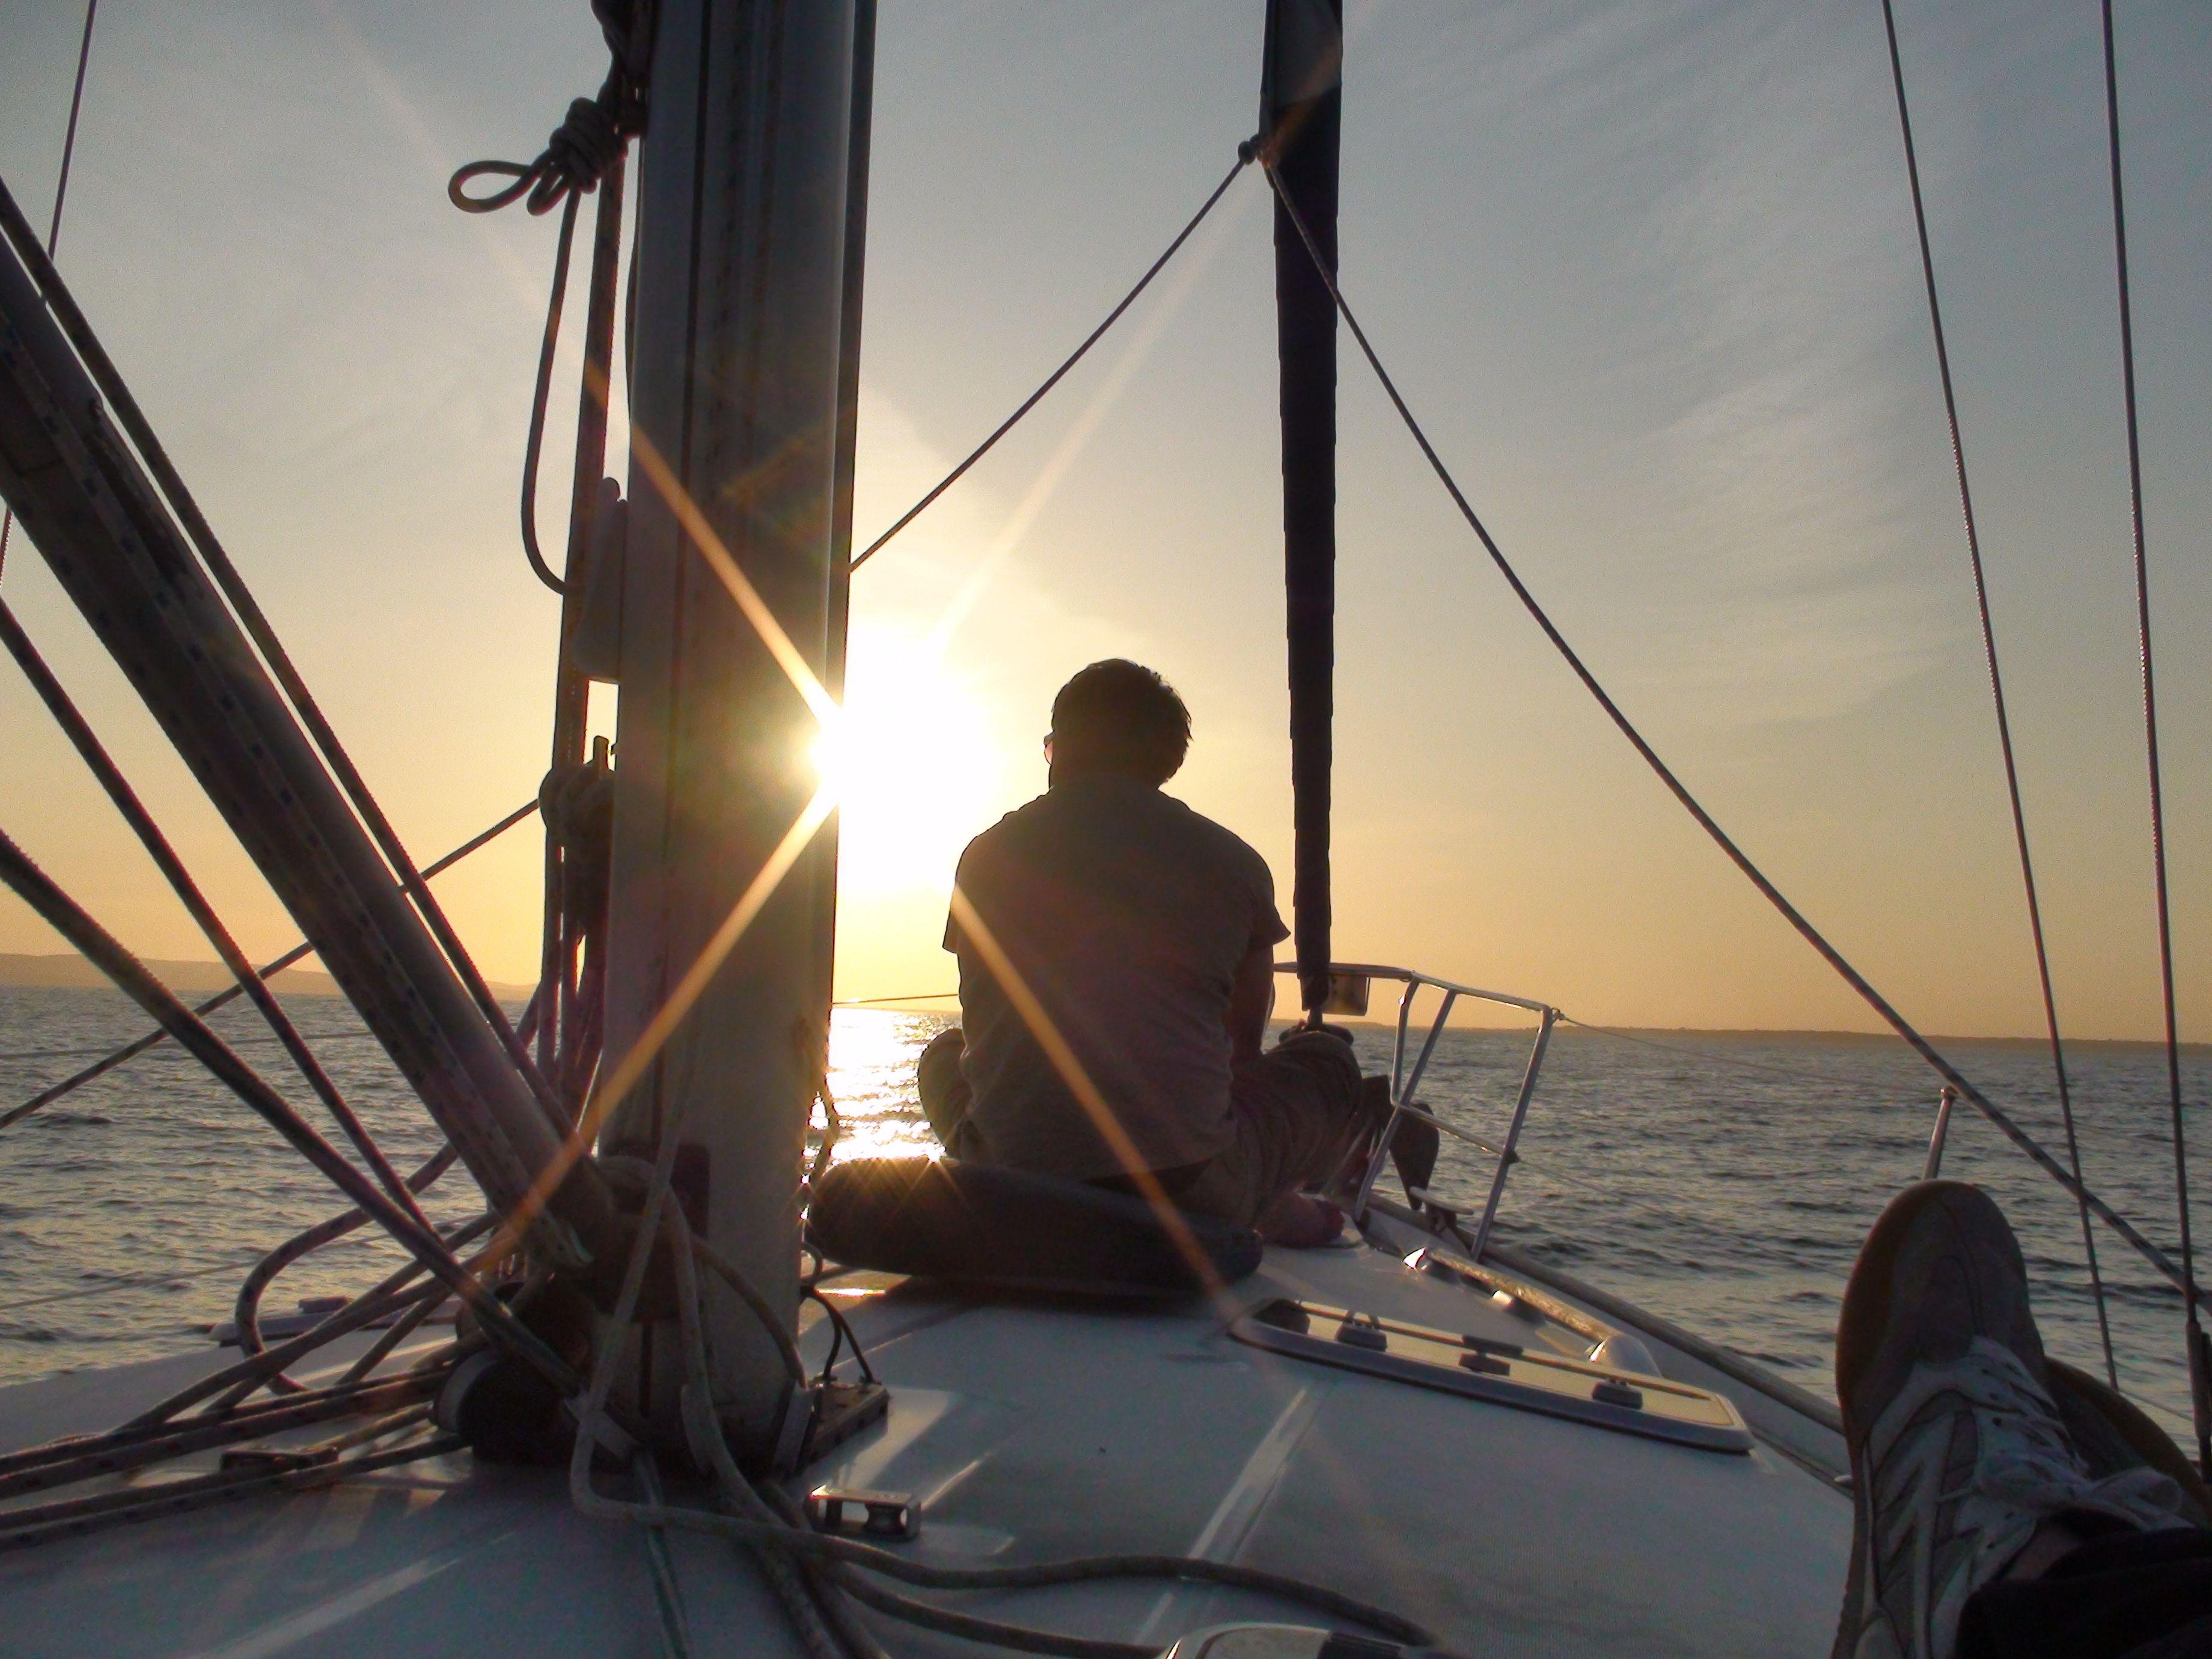 May Bank Holiday Weekend Sailing Trip to the Jurassic Coast Weymouth/Poole